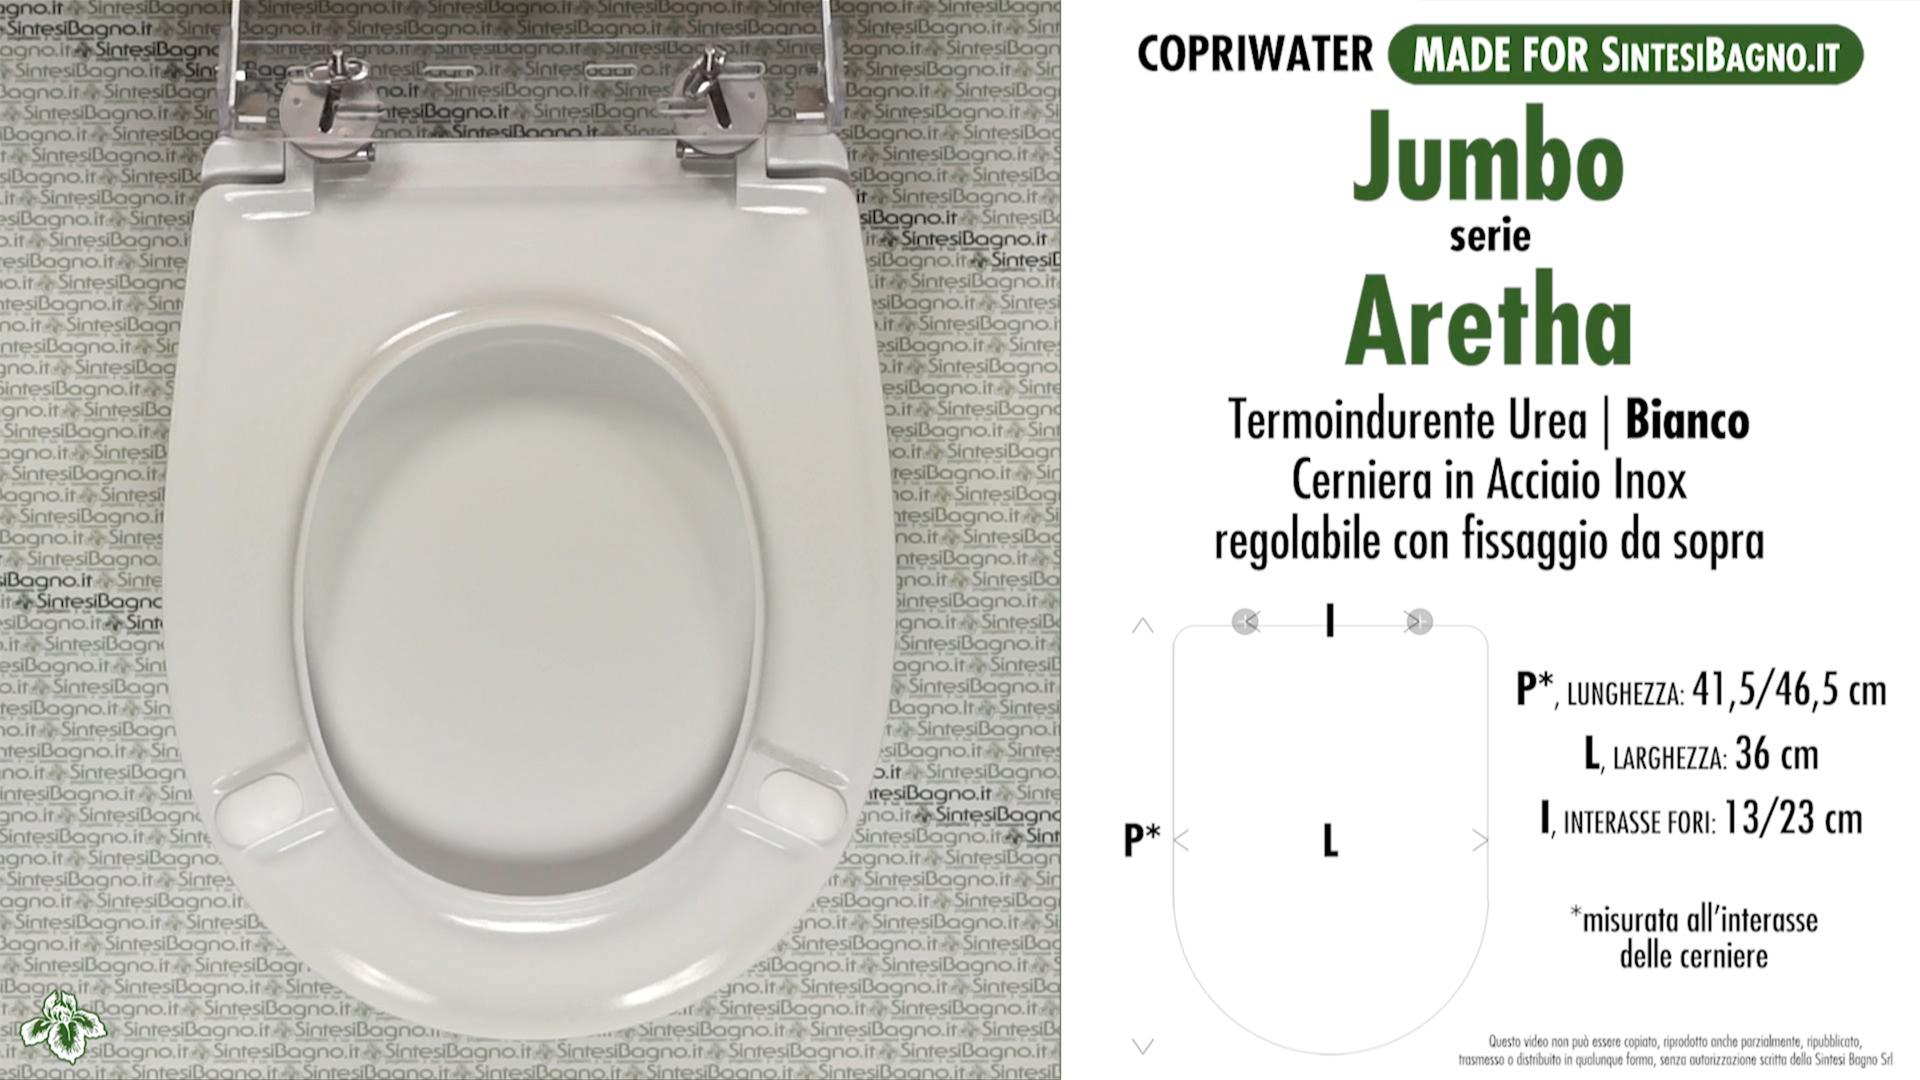 SCHEDA TECNICA MISURE copriwater JUMBO 2 ARETHA